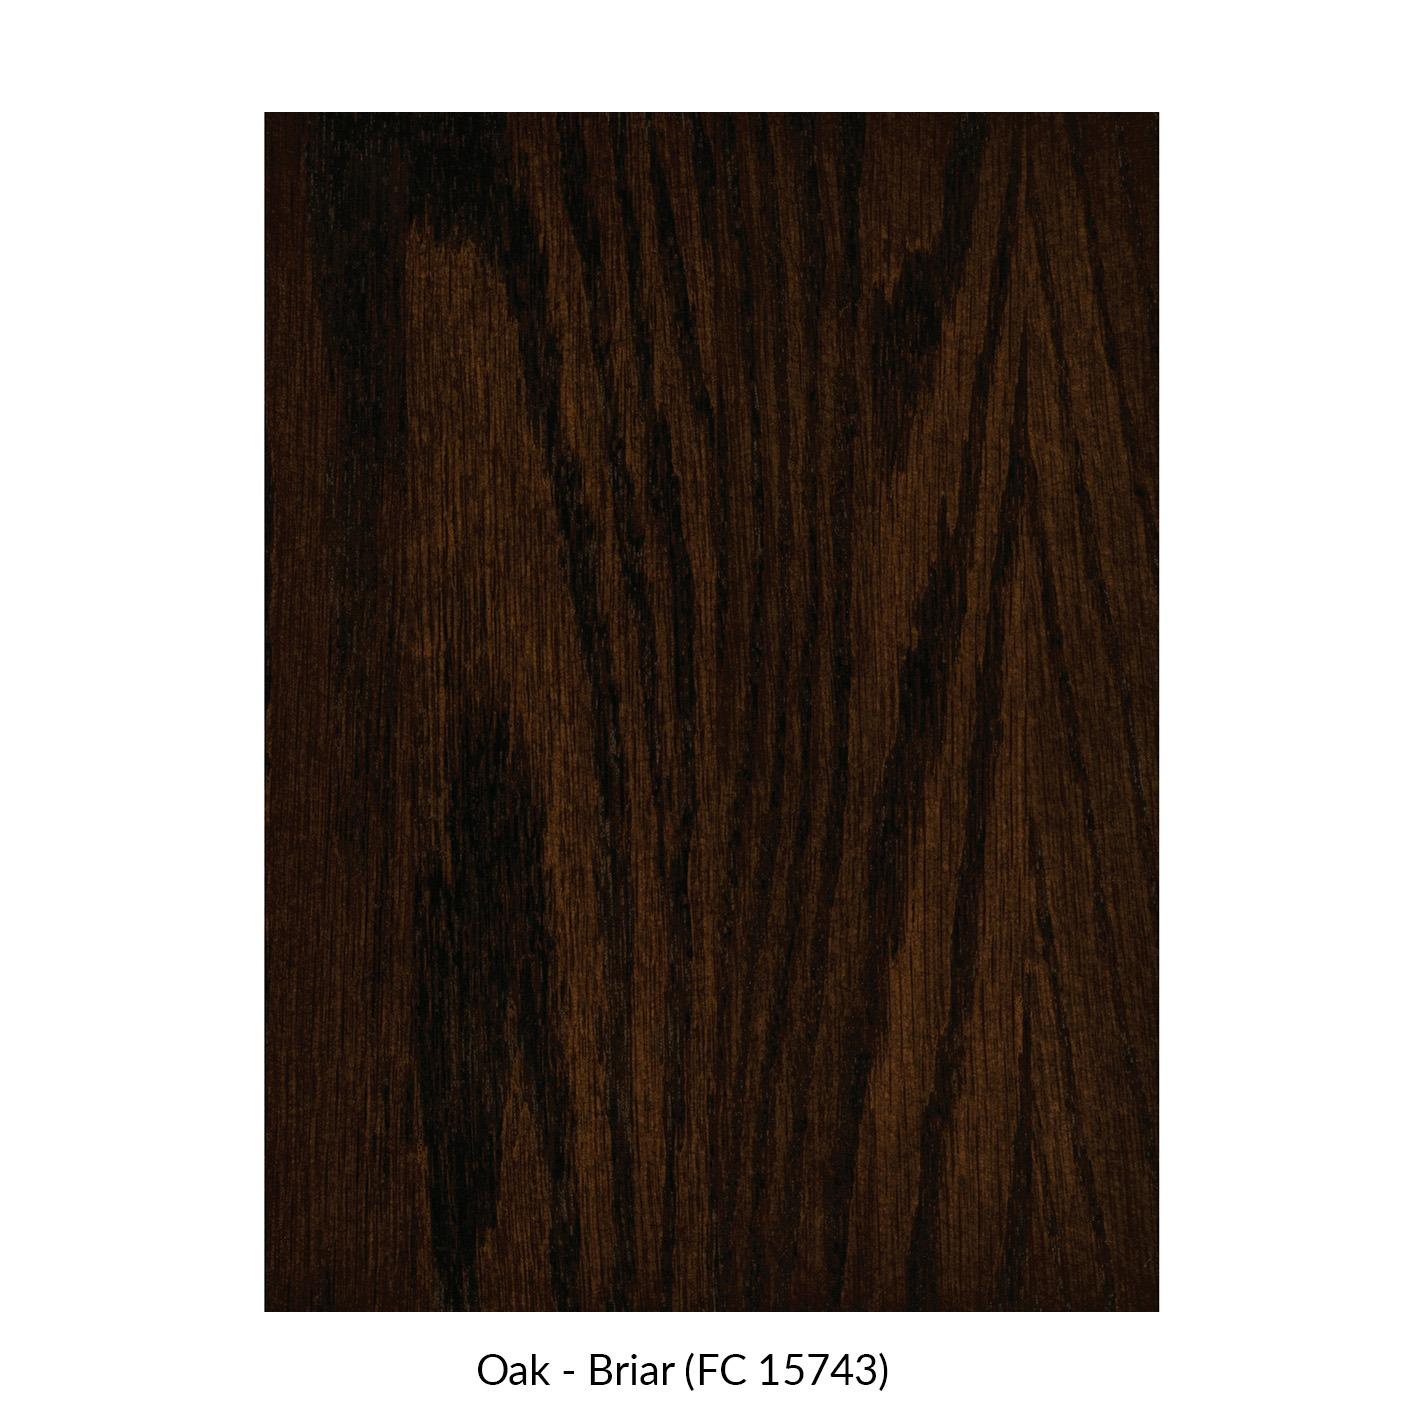 spectrum-oak-briar-fc-15743.jpg